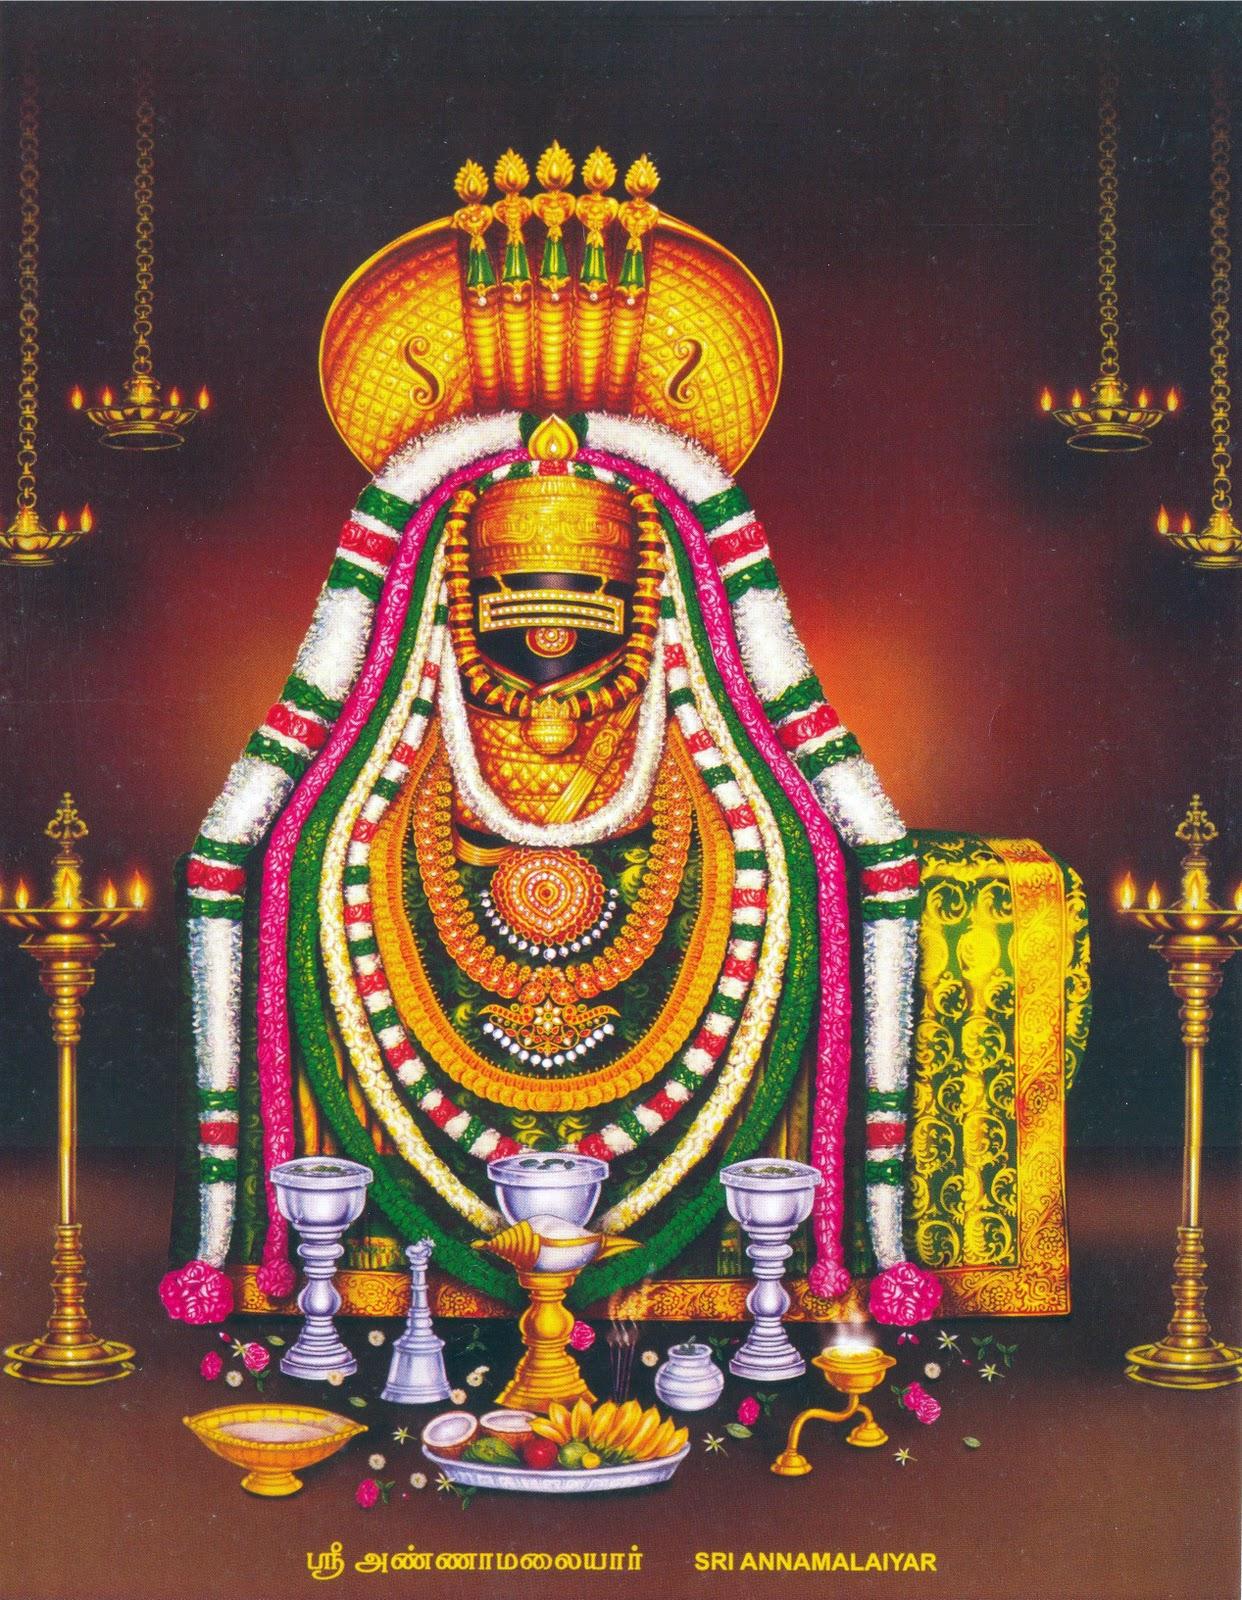 God Sivalingam Wallpapers | www.imgkid.com - The Image Kid ...